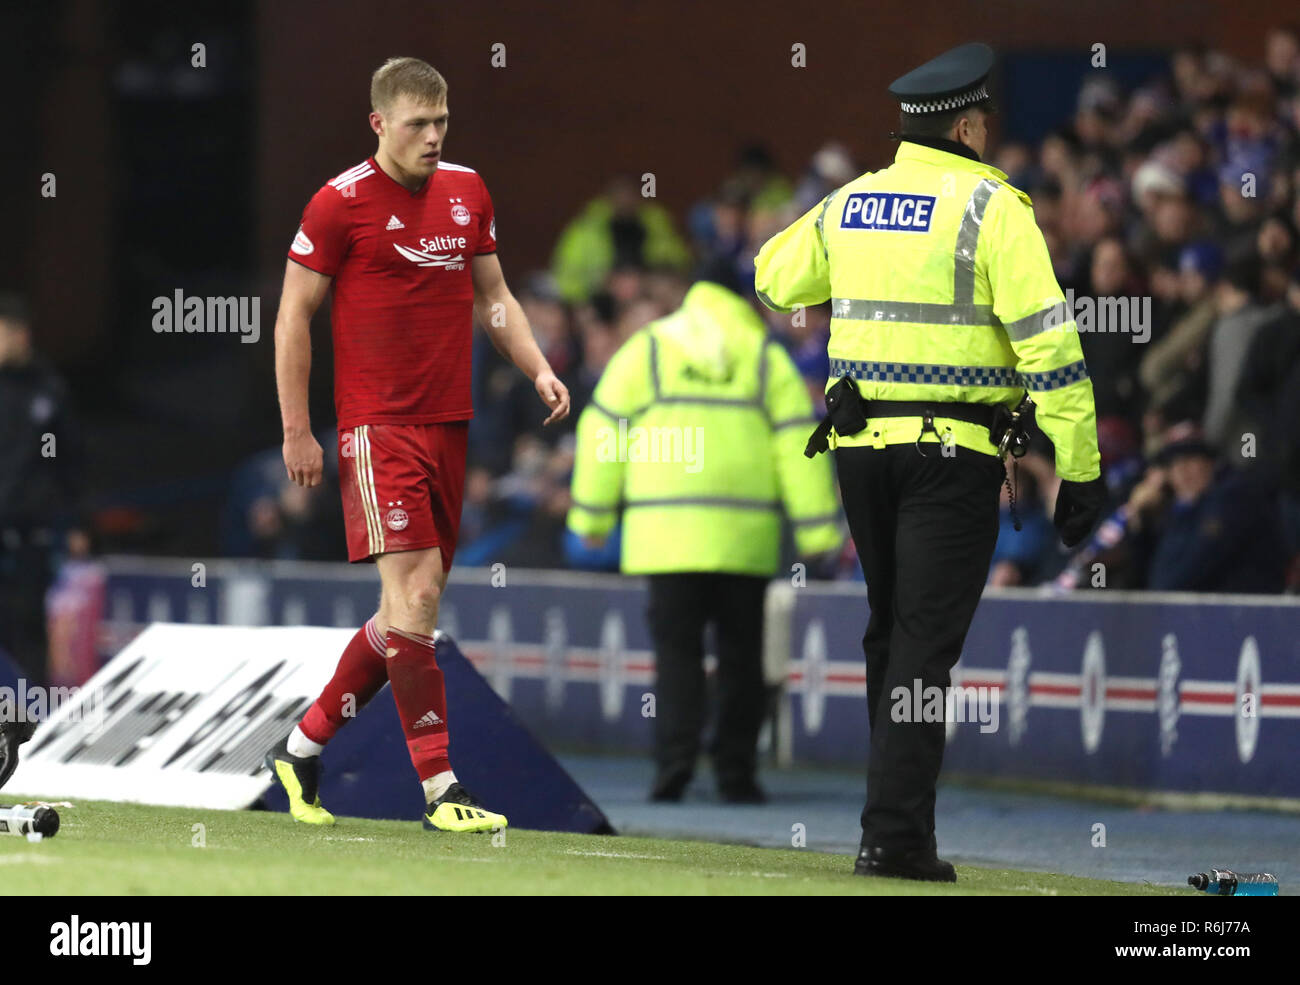 Aberdeen's Sam Cosgrove is sent off during the Ladbrokes Scottish Premiership match at Ibrox Stadium, Glasgow. - Stock Image